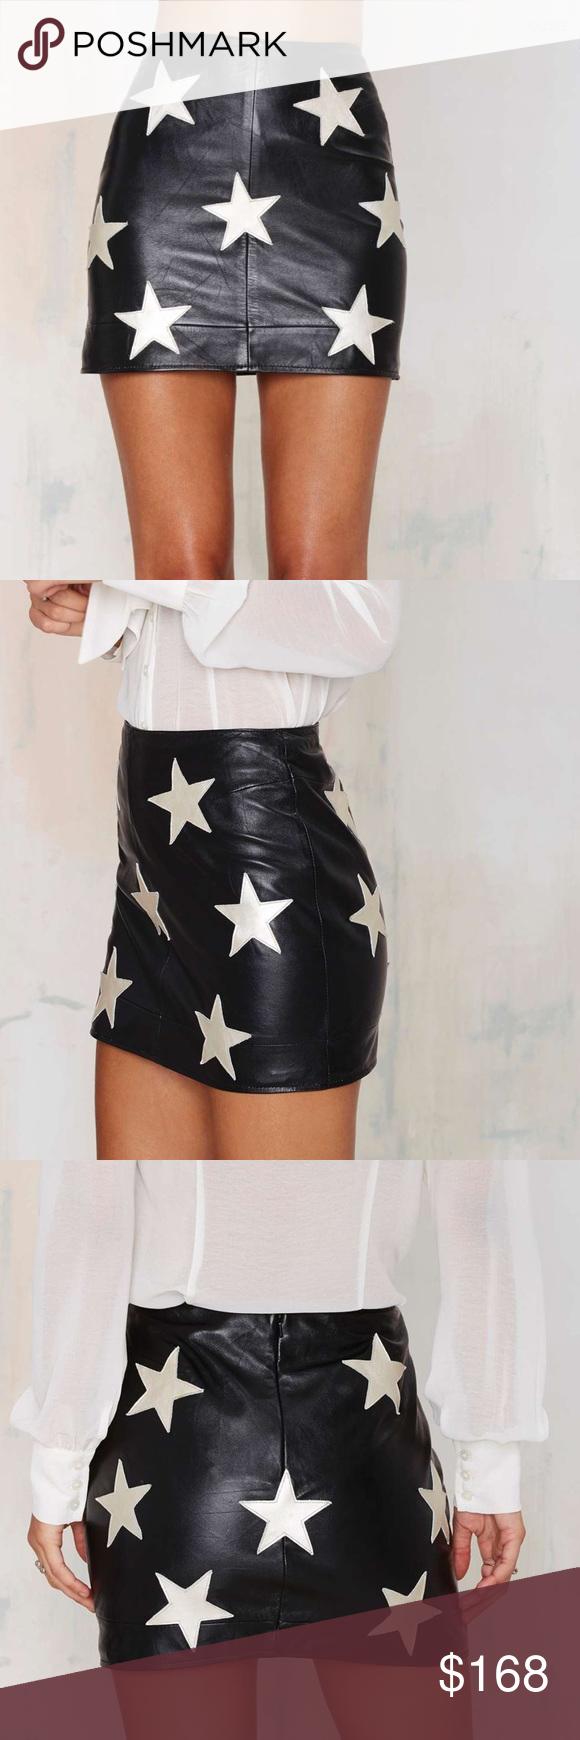 Vintage Silver Star Leather Skirt